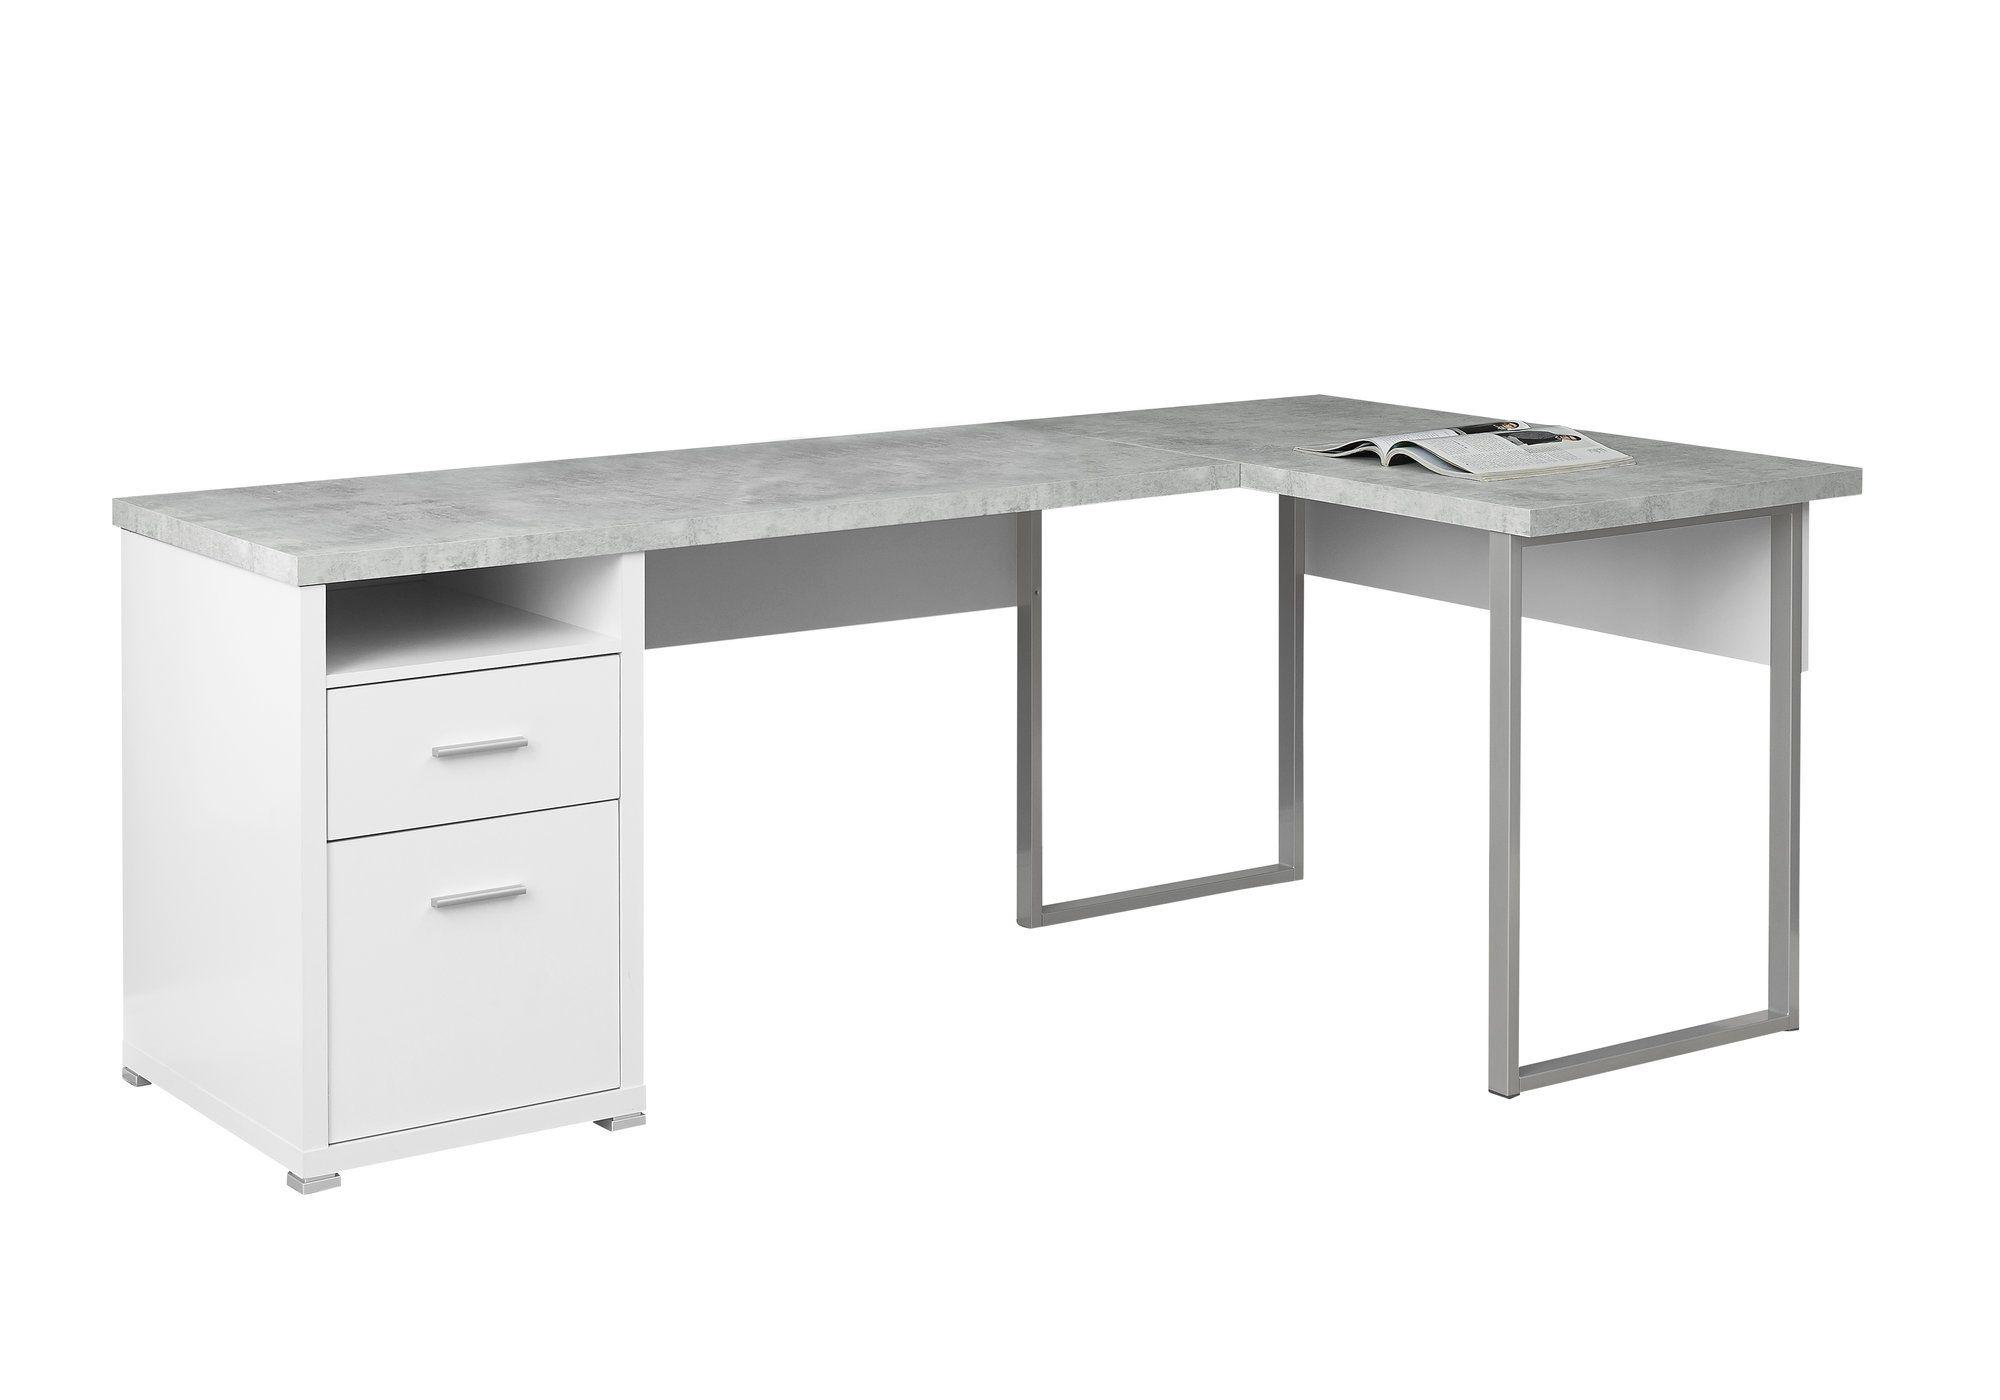 Monarch Specialties Monarch White L Shaped Computer Desk In 2020 L Shaped Corner Desk Corner Desk White Computer Desk